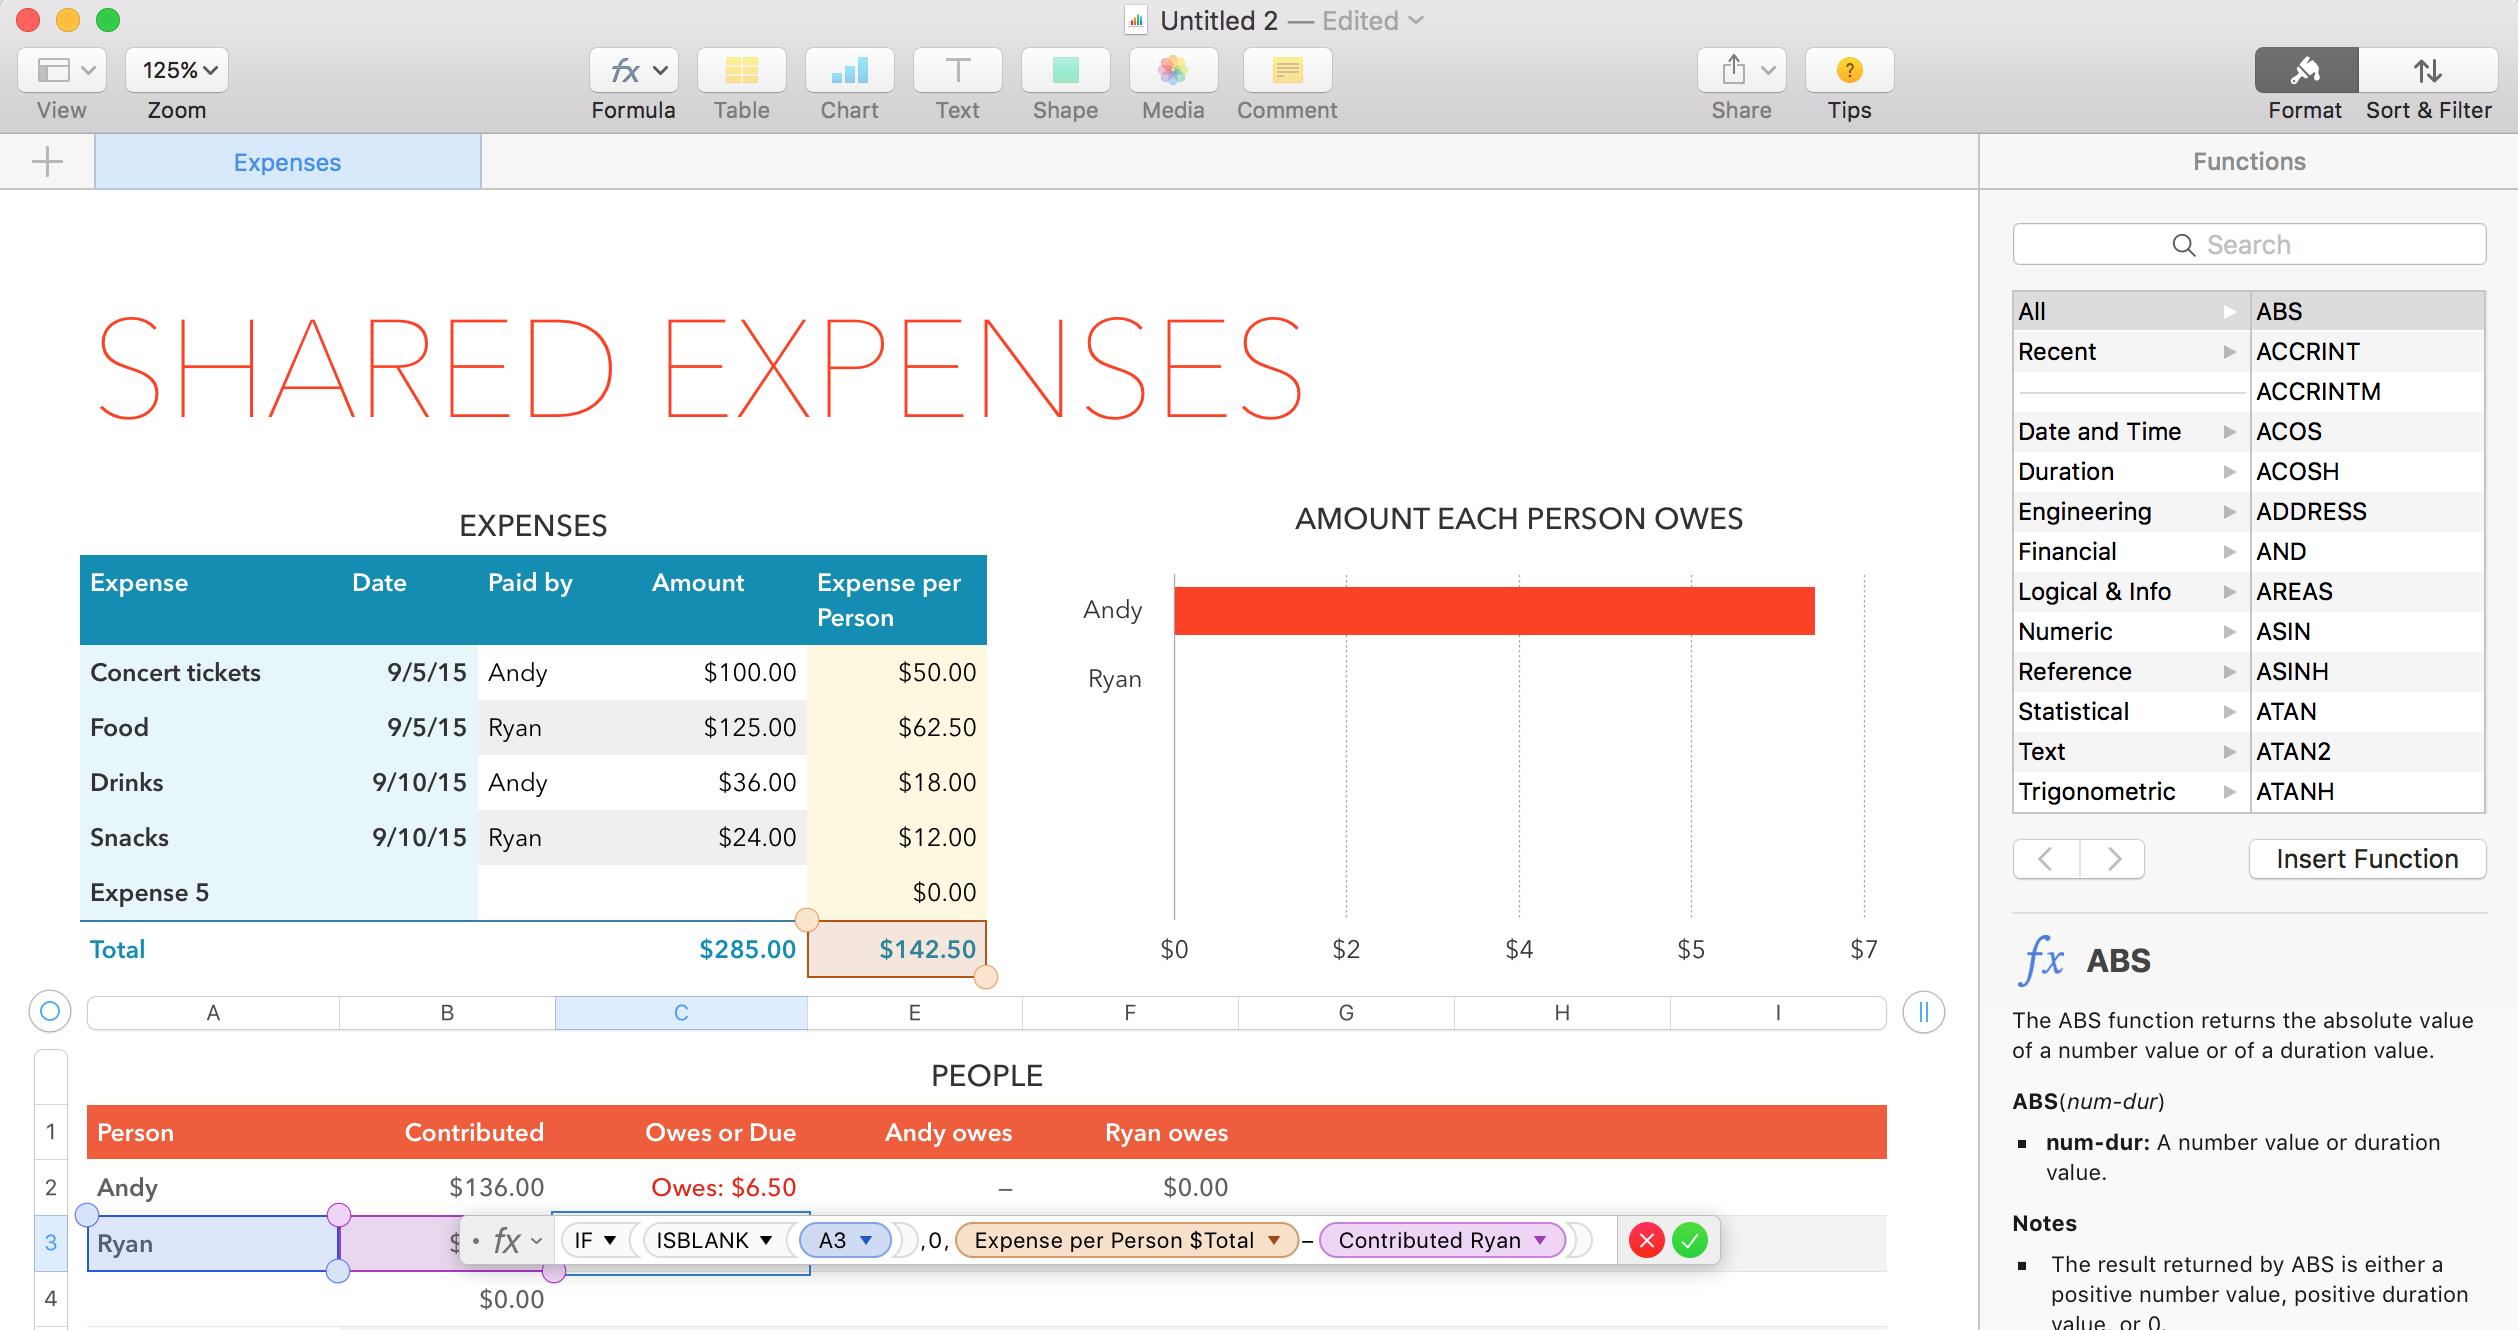 Best Spreadsheet App For Ipad Inside From Visicalc To Google Sheets: The 12 Best Spreadsheet Apps